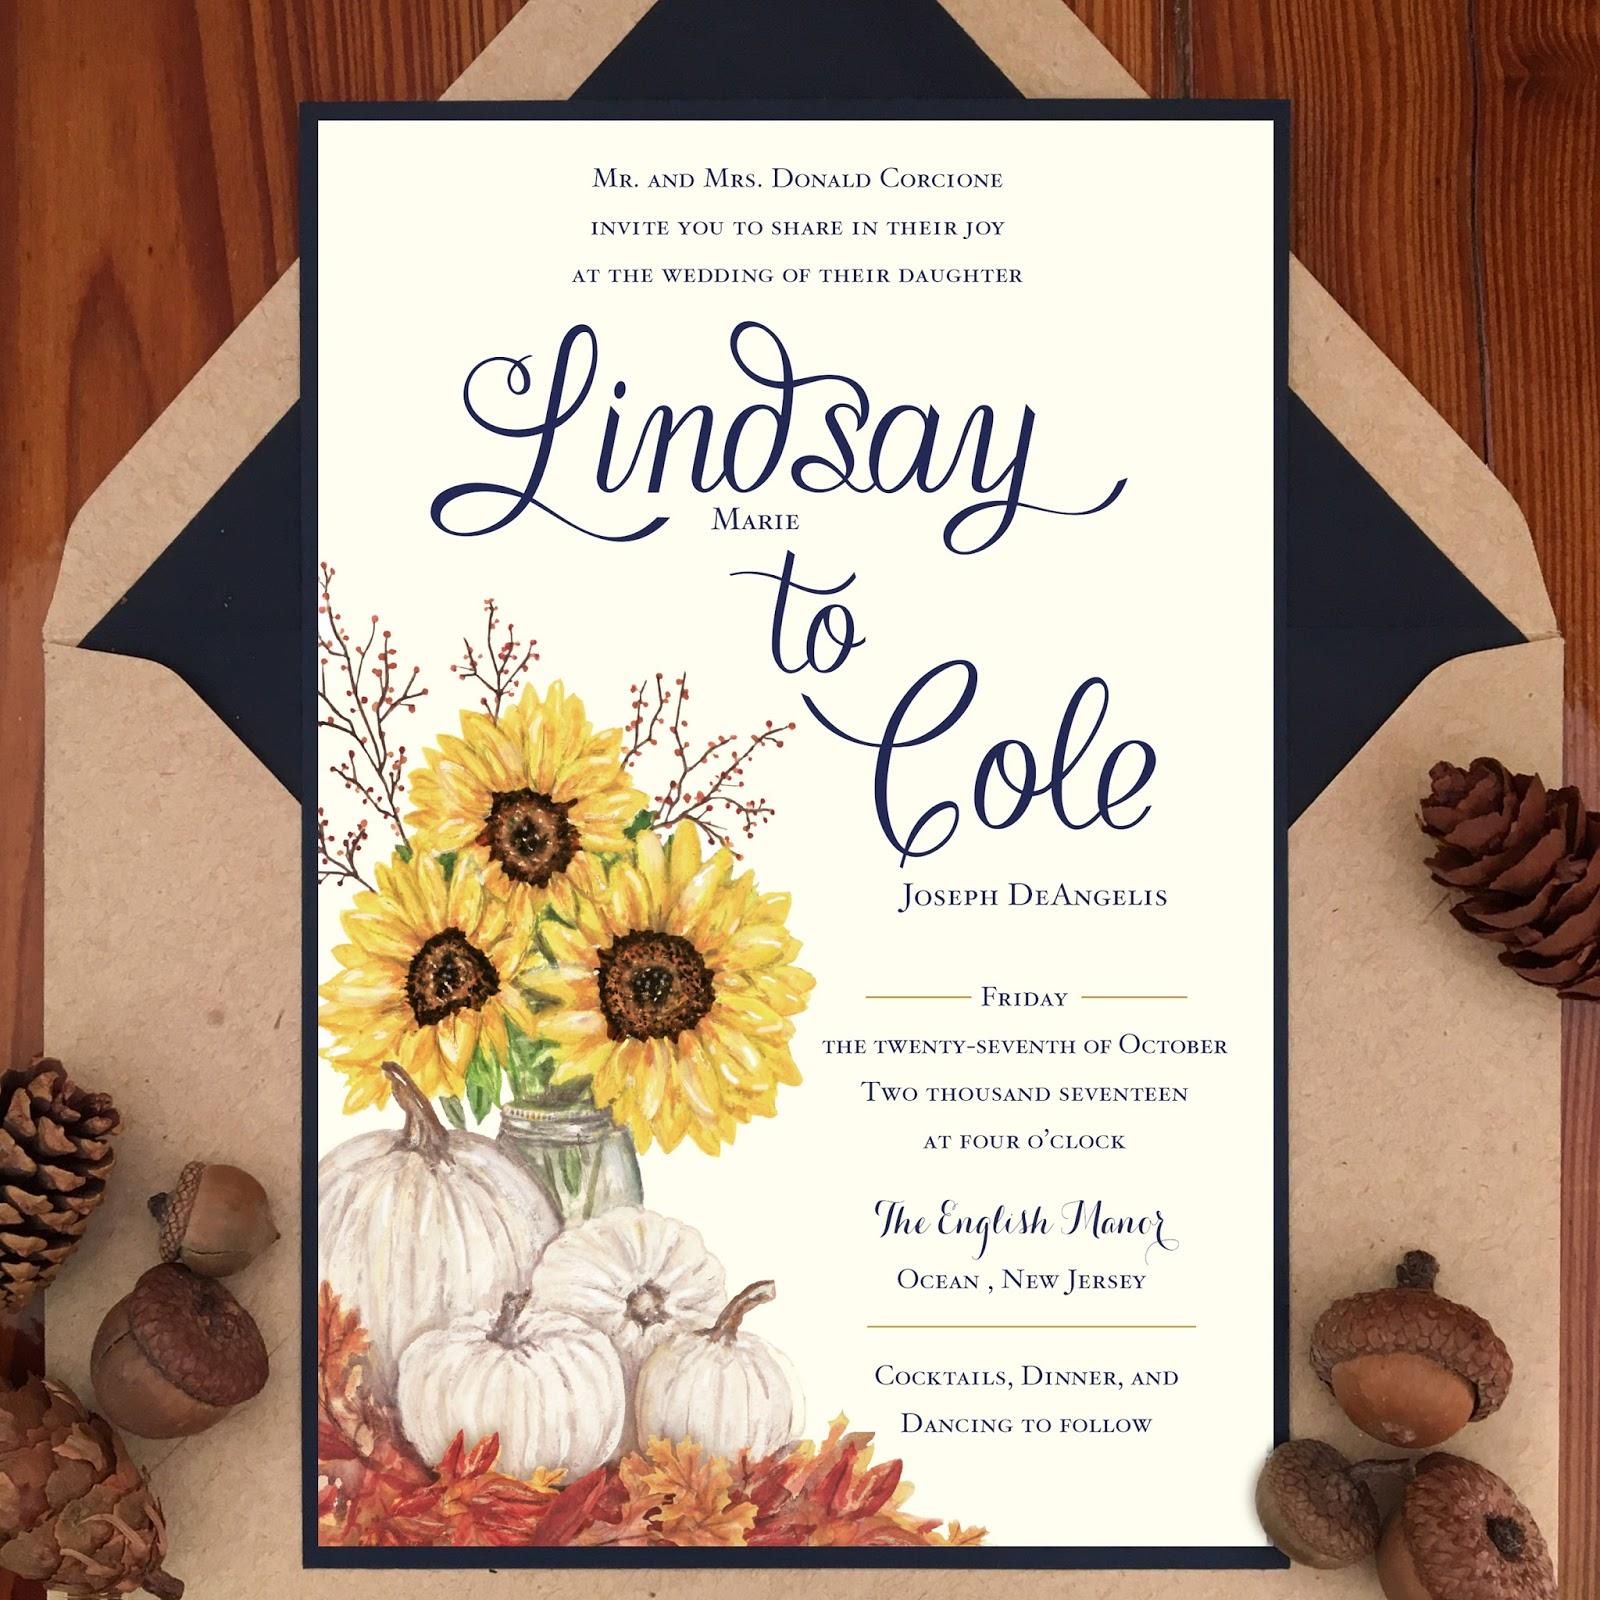 Invitations, Ink, Social Design Studio: Autumn Florals and White ...